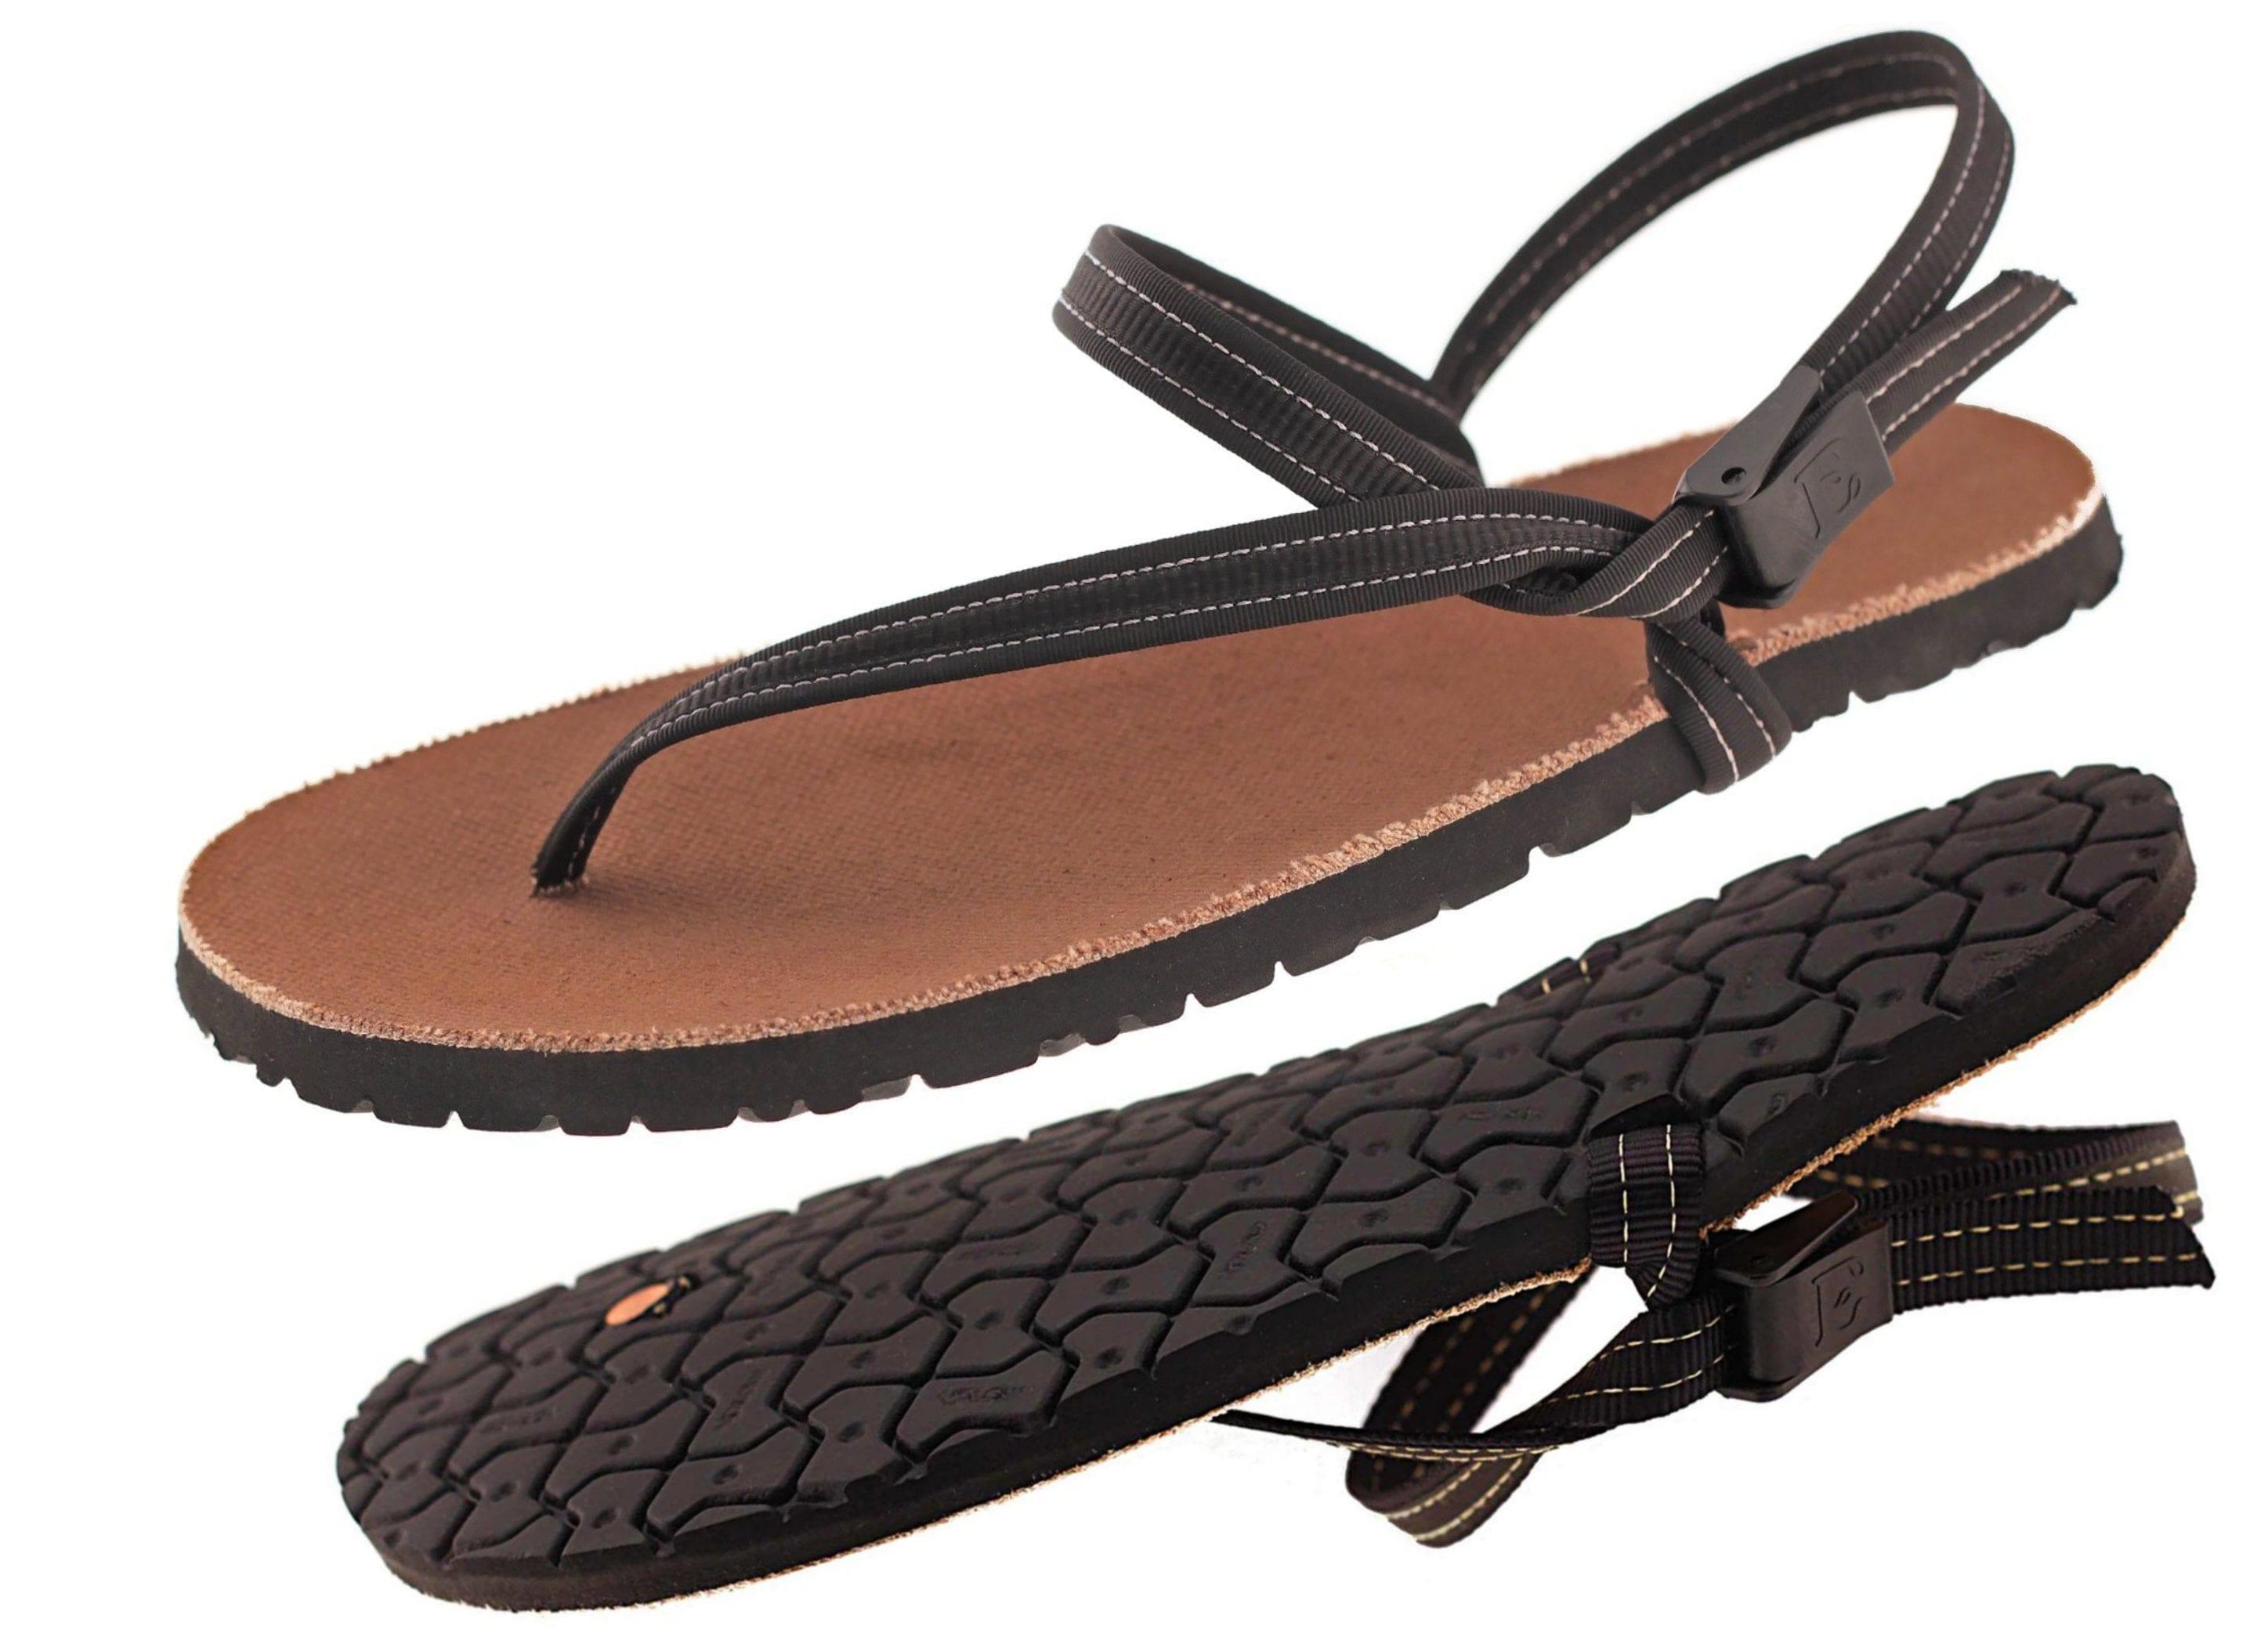 Earth Runners Alpha Adventure Sandals